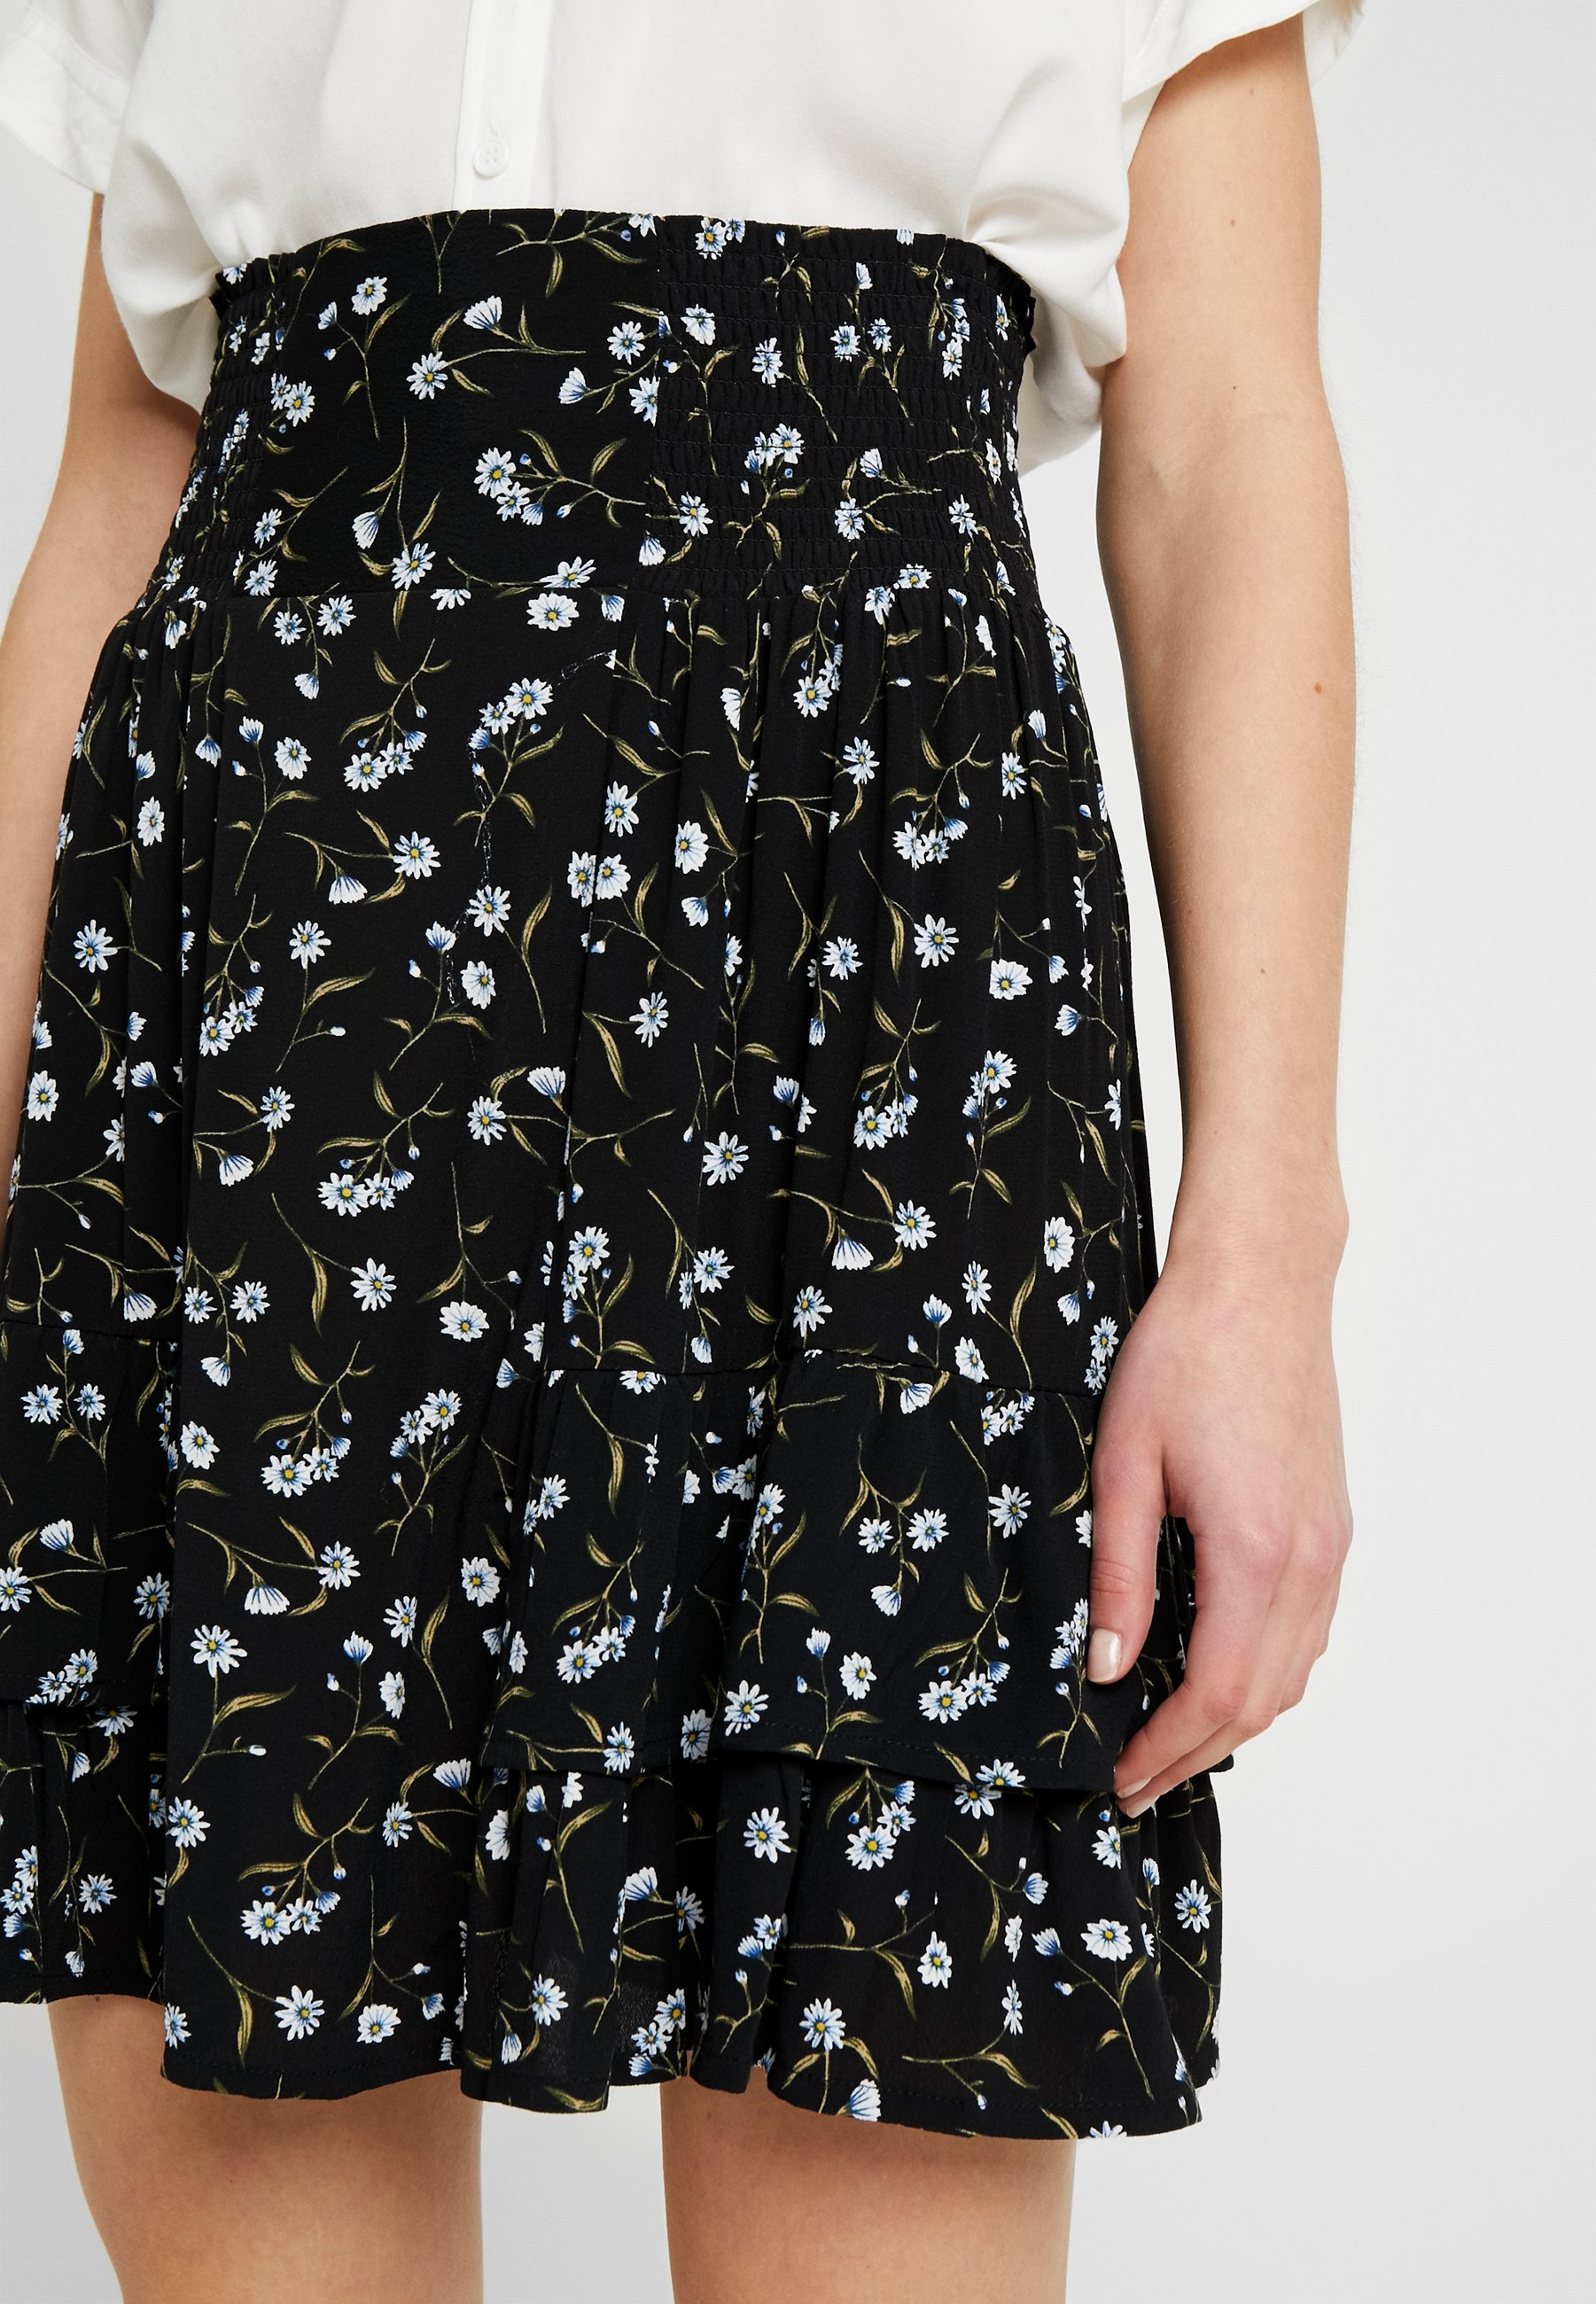 Yas Daisy Skirt - A-lijn Rok Black 2hGYCe7L